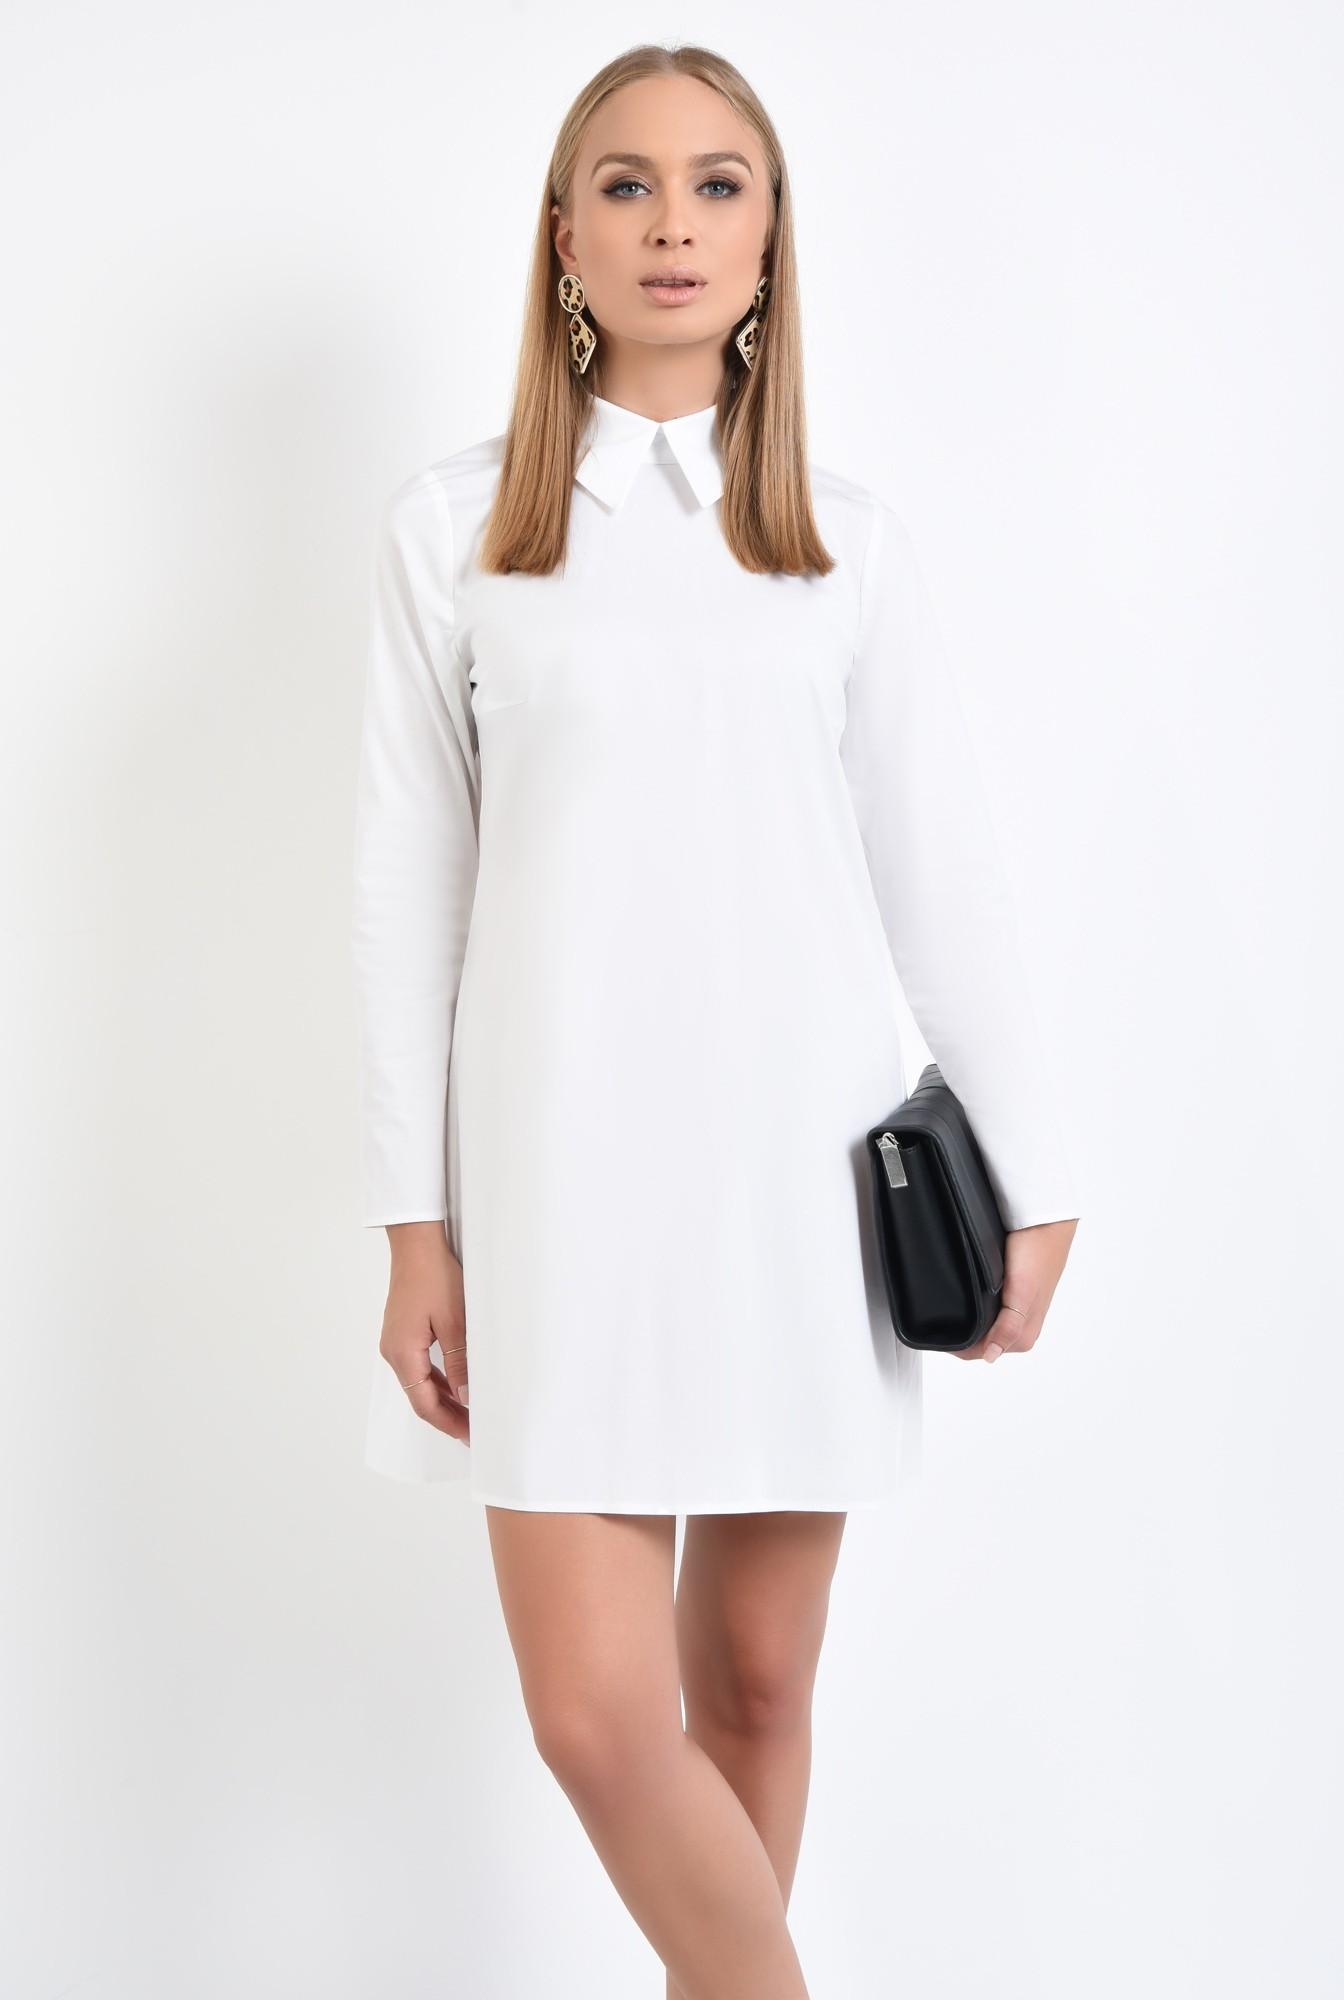 2 - rochie casual, croi lejer, pliuri, guler aplicat, stil camasa